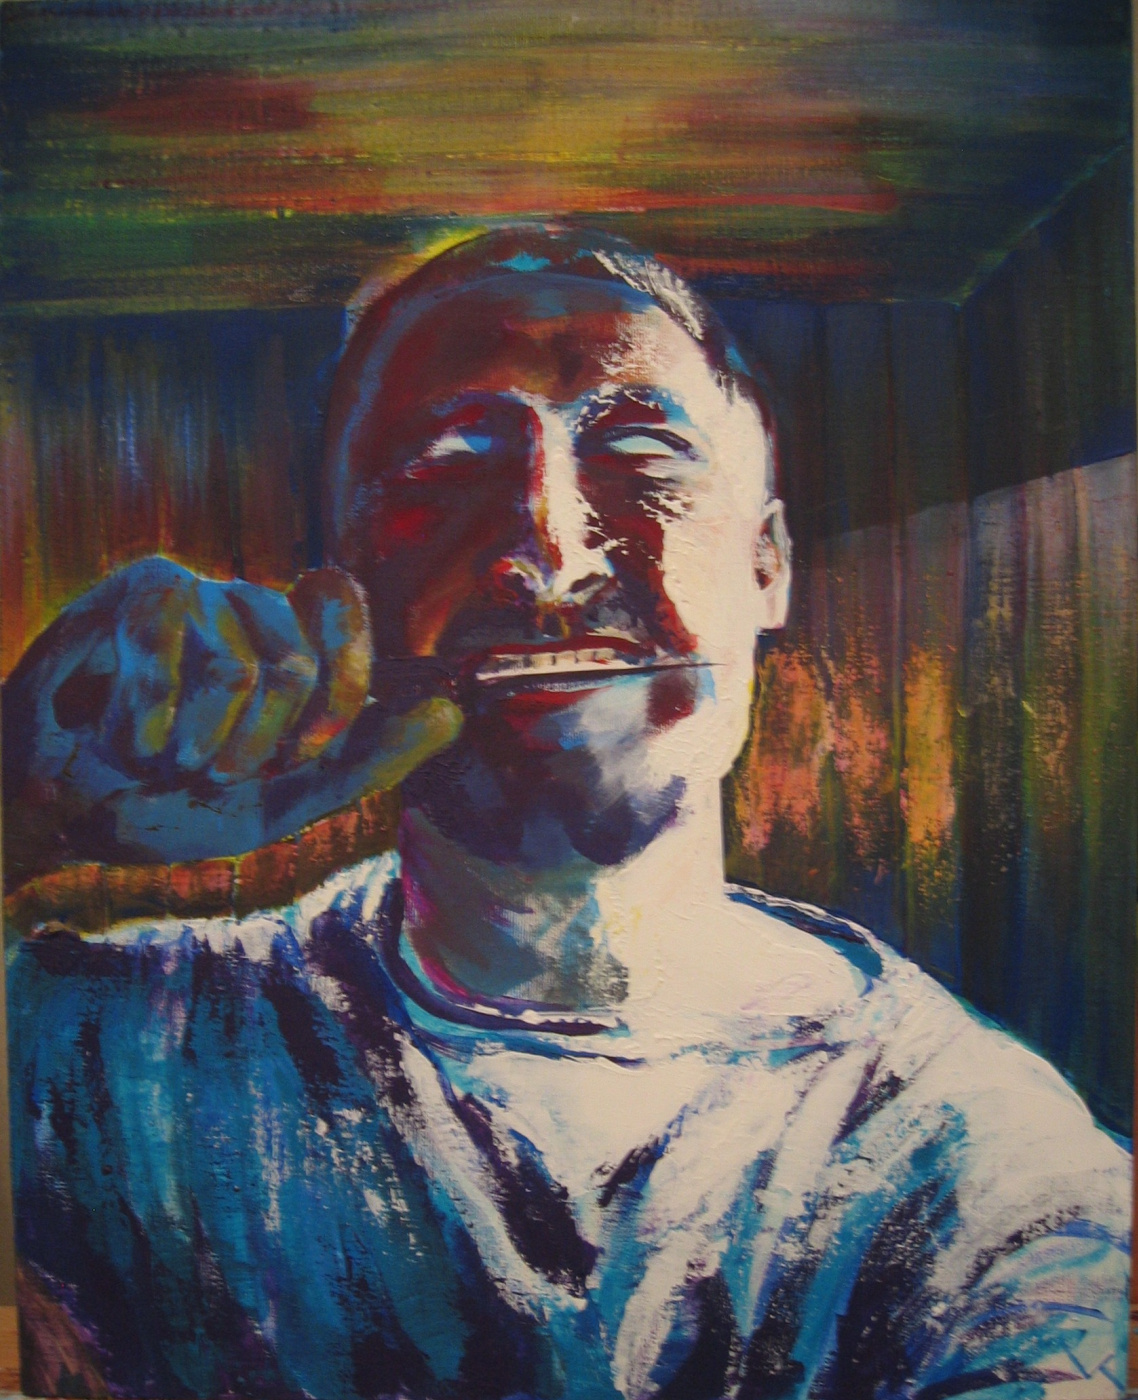 Nikolai margin. Self-portrait with a knife in his teeth